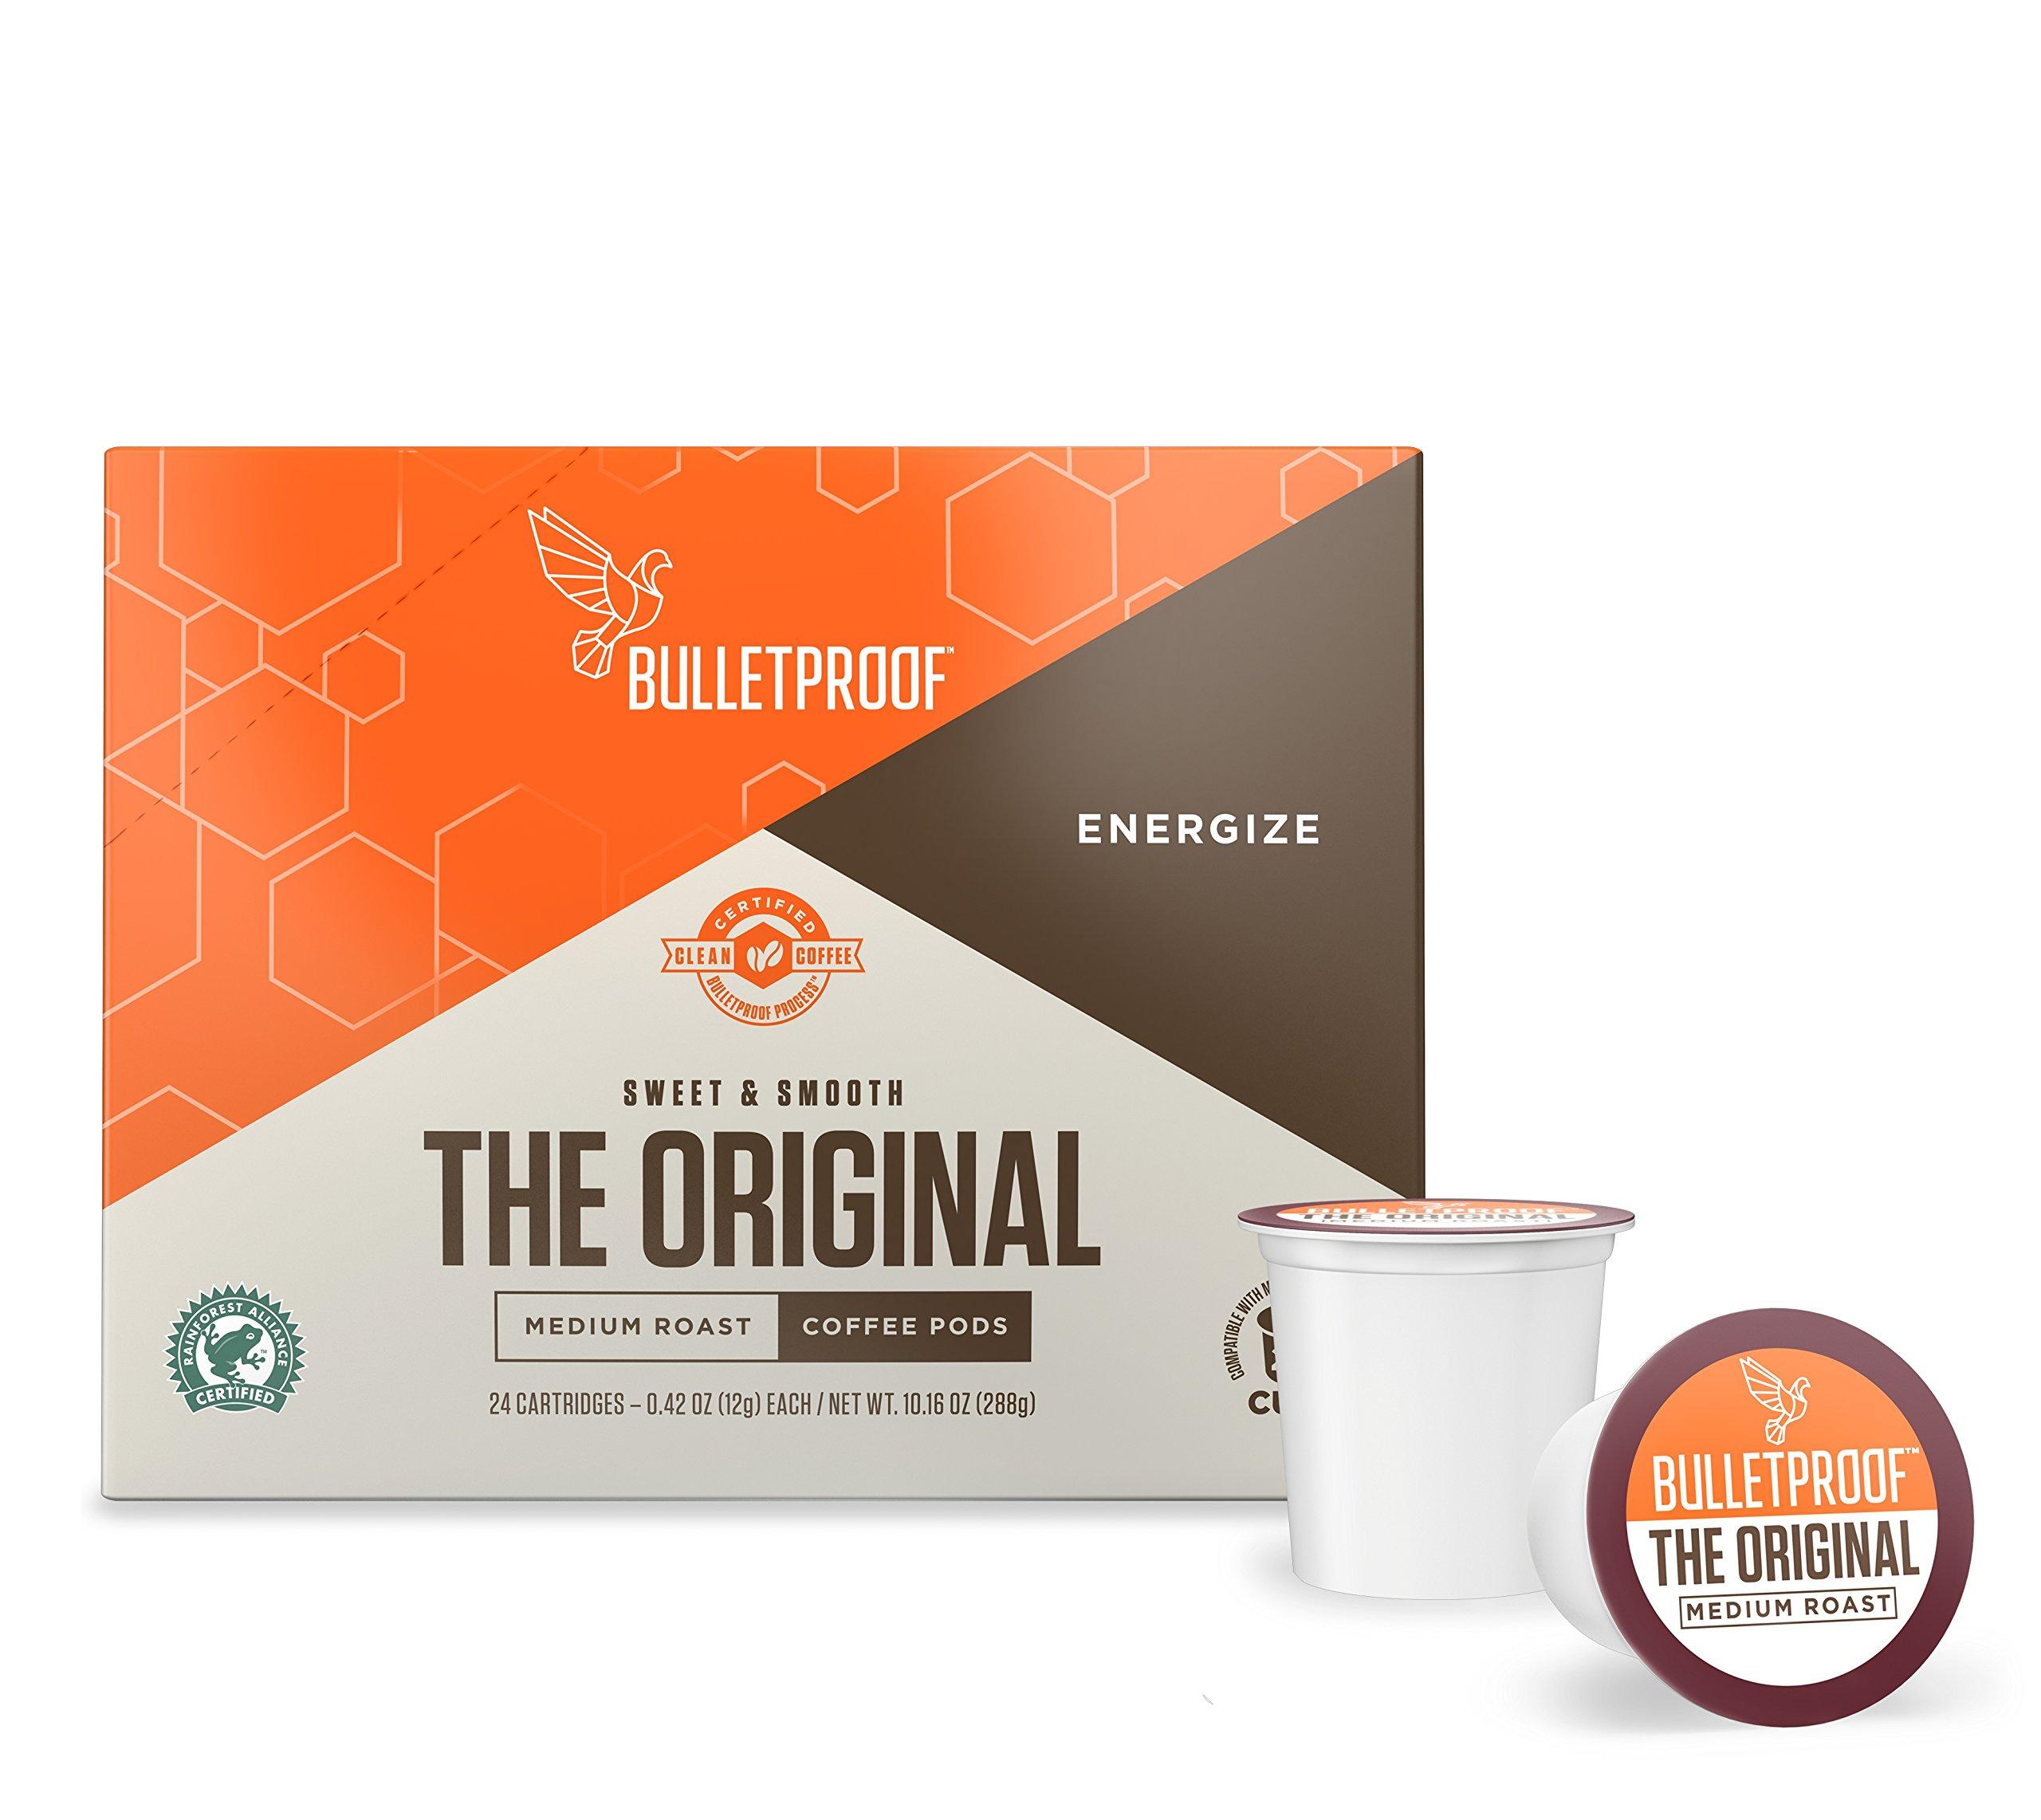 Bulletproof The Original Roast Coffee Pods, Premium Medium Roast Organic Beans, Single-Serve K Cups, Works With Keurig 2.0 (24 Count)